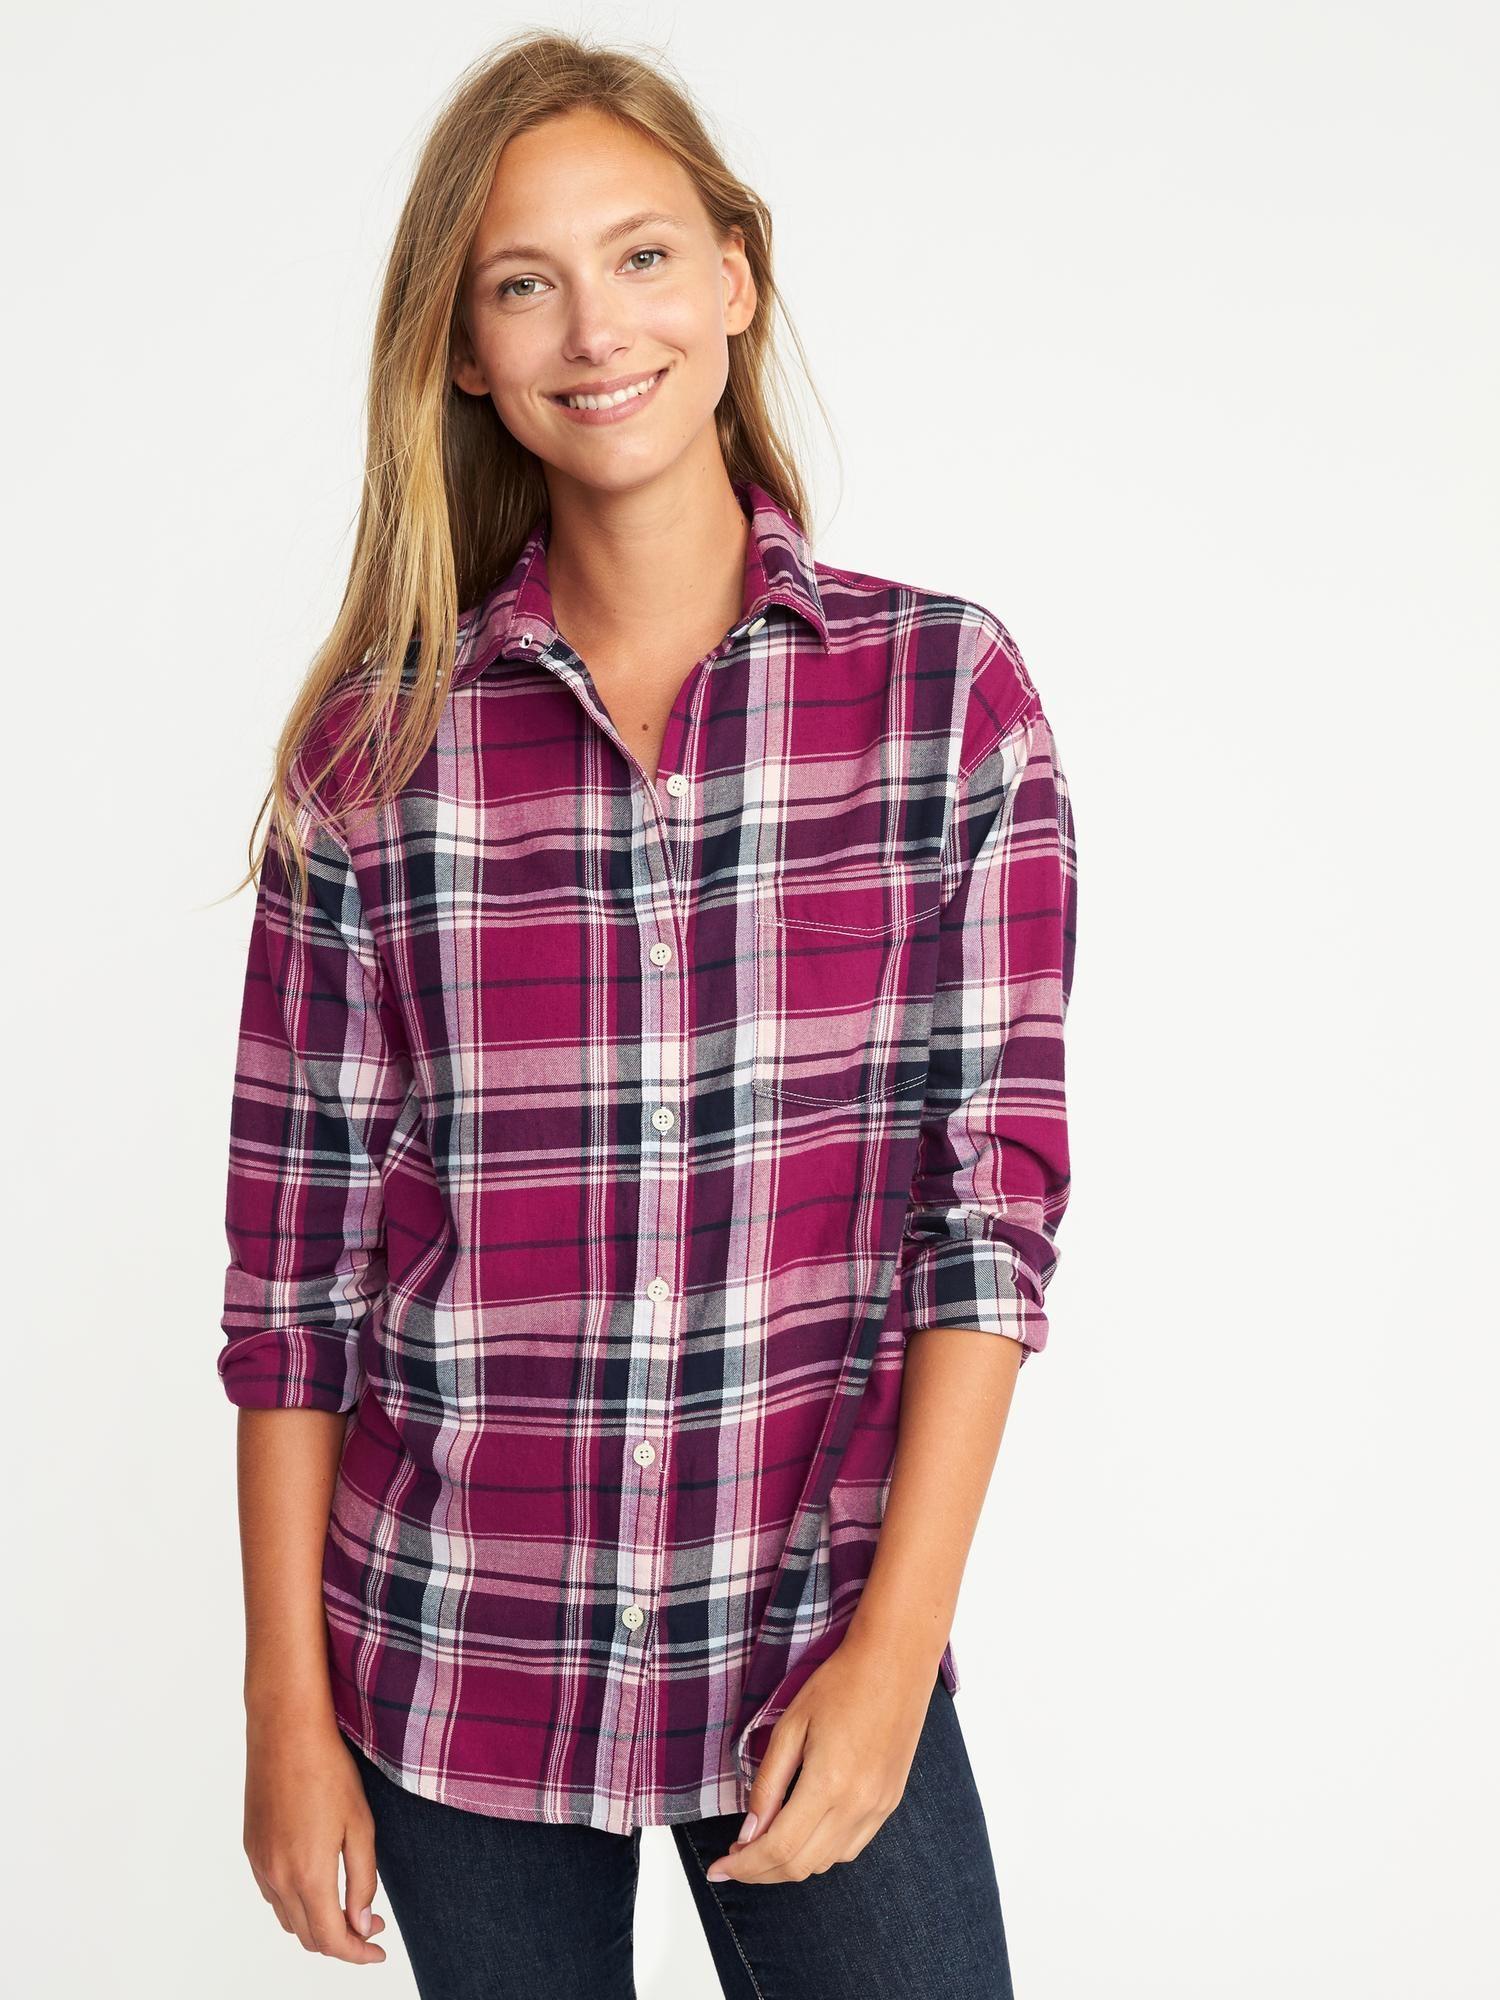 Flannel dress womens  Plaid Boyfriend Shirt for Women  Old Navy  Stuff I Like